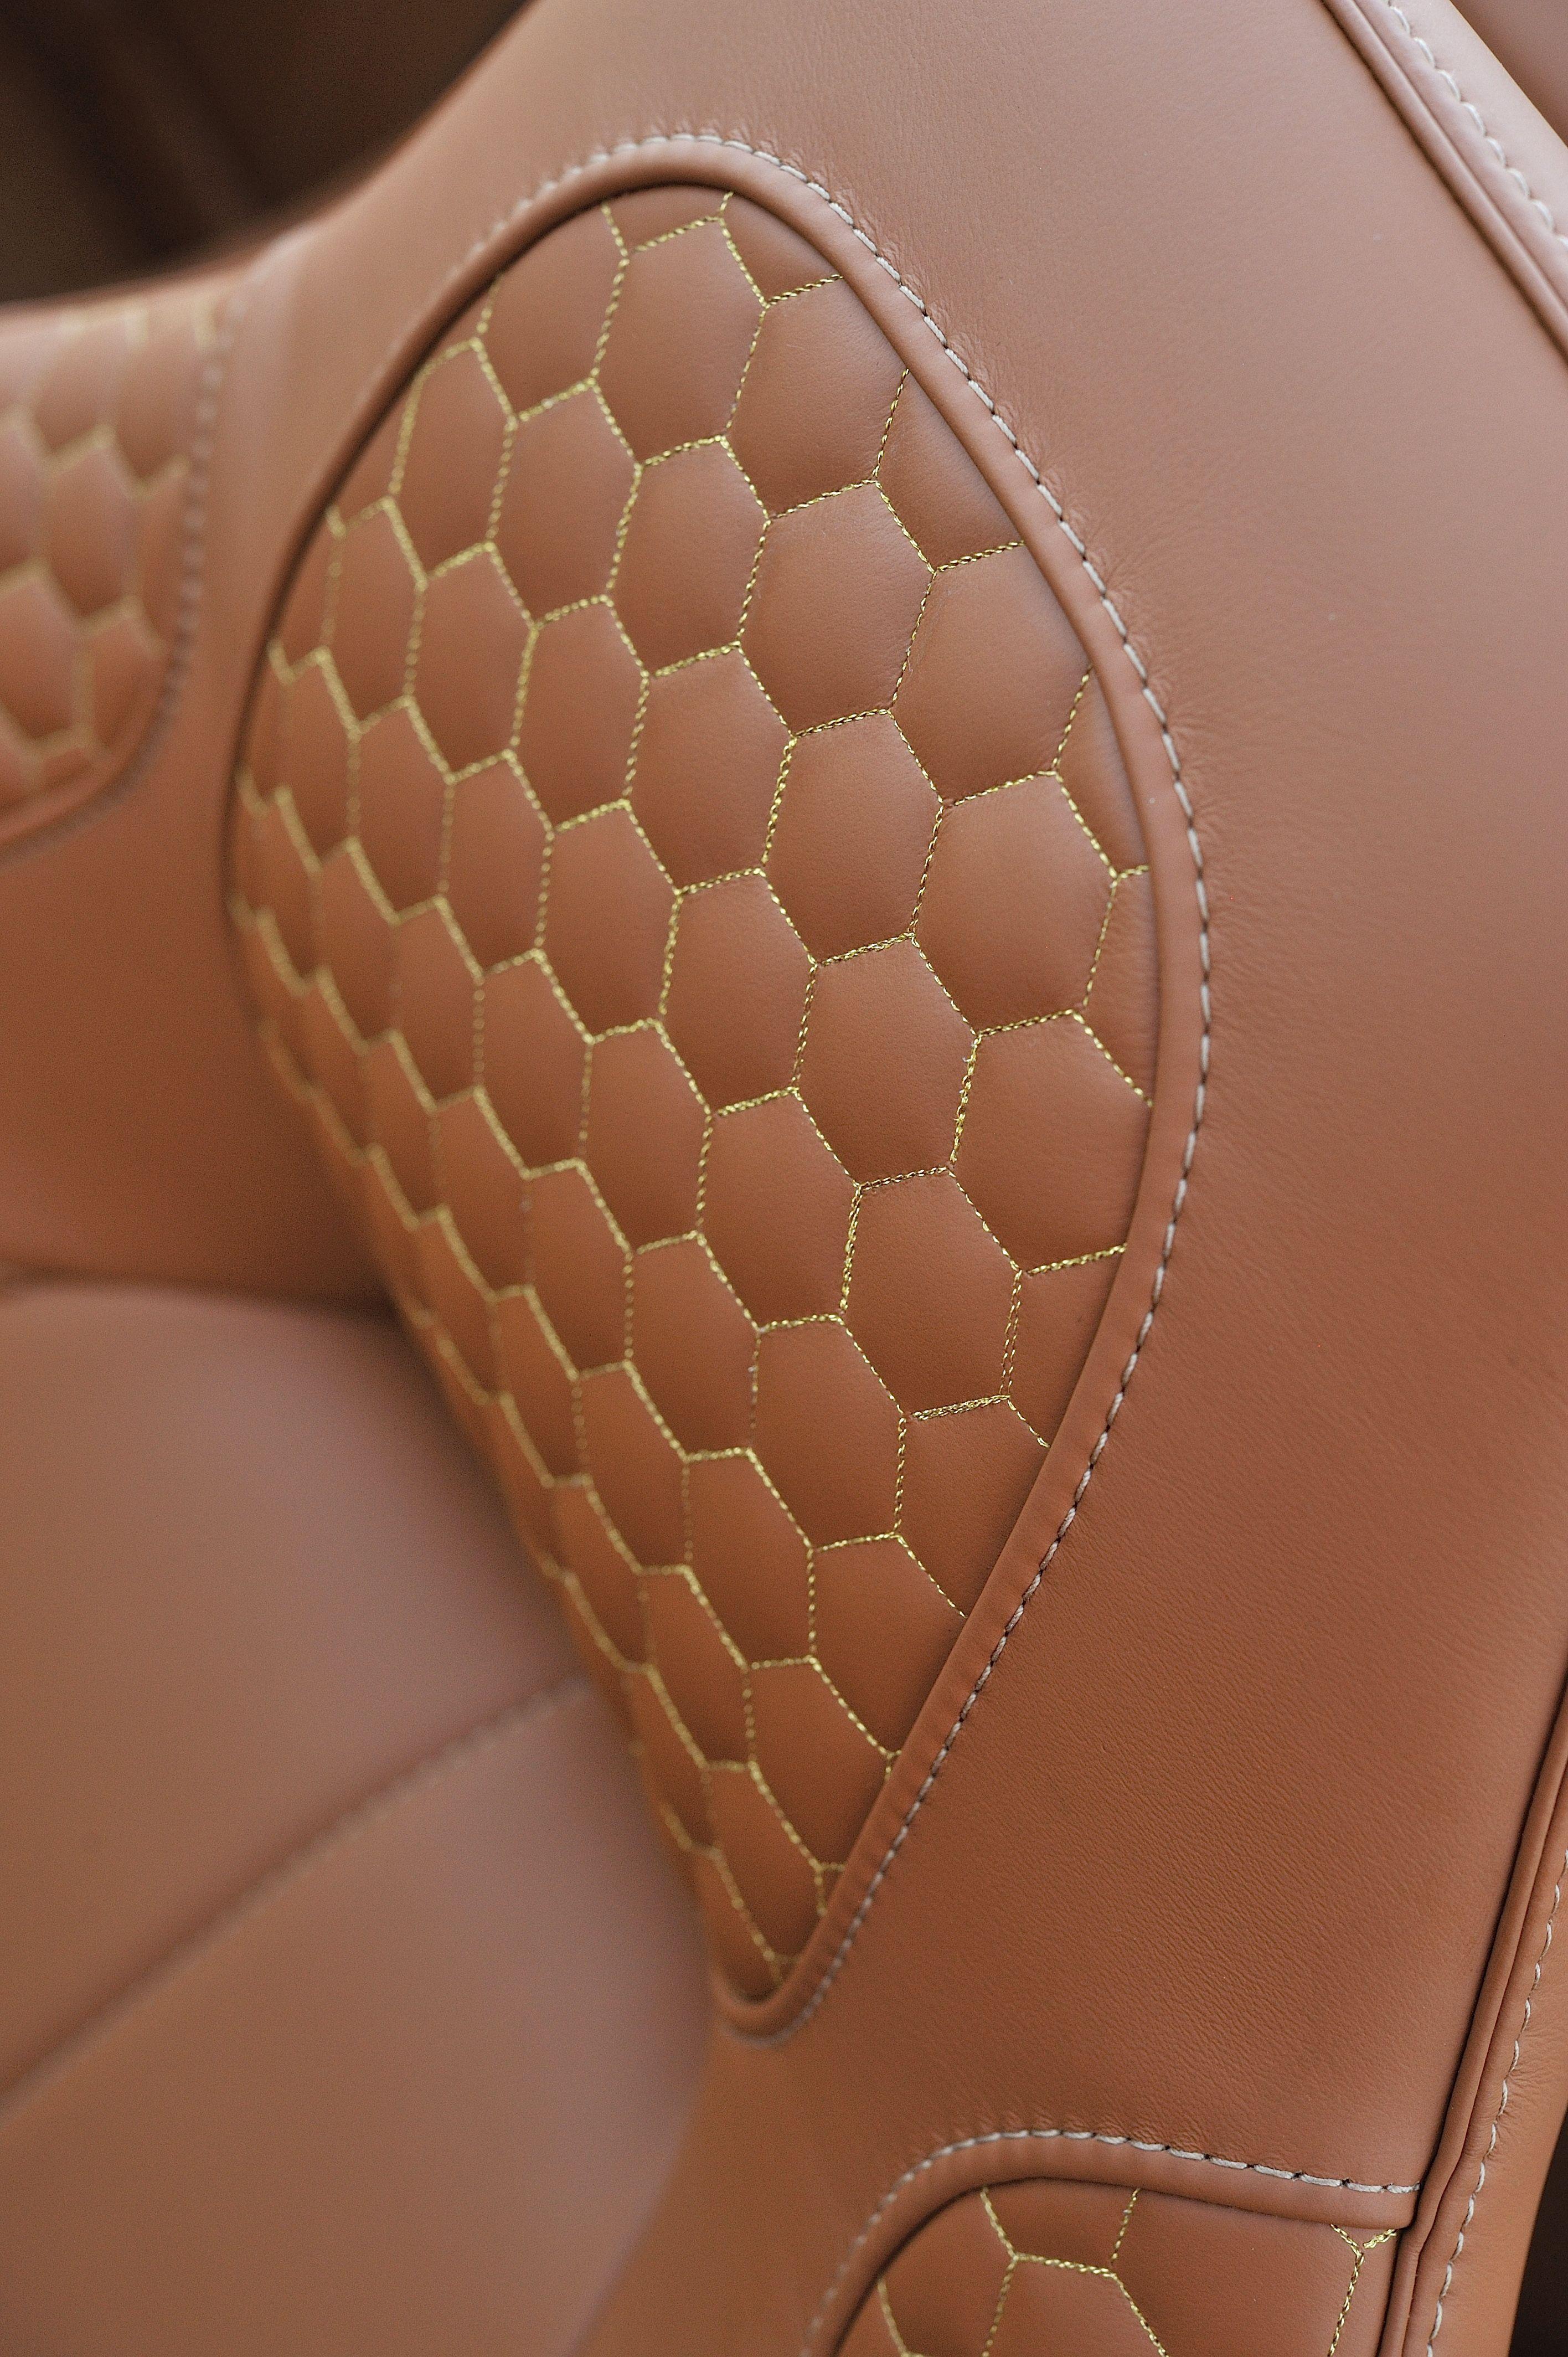 Aston Martin Vanquish Volante Automotive Upholstery Luxury Car Interior Leather Car Seats